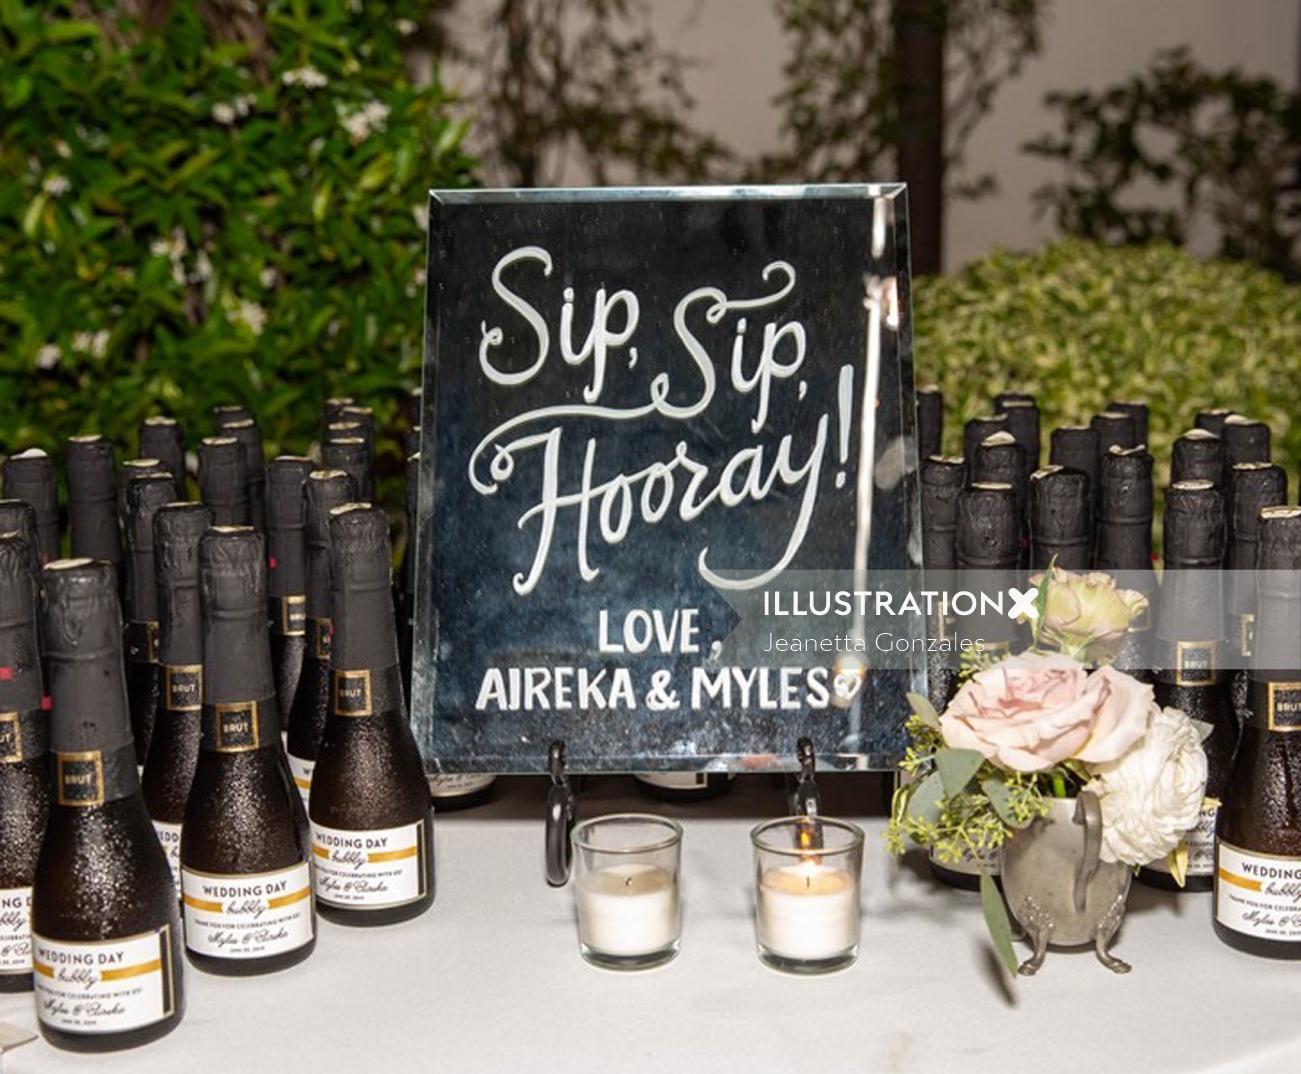 Typography art of sip sip hooray